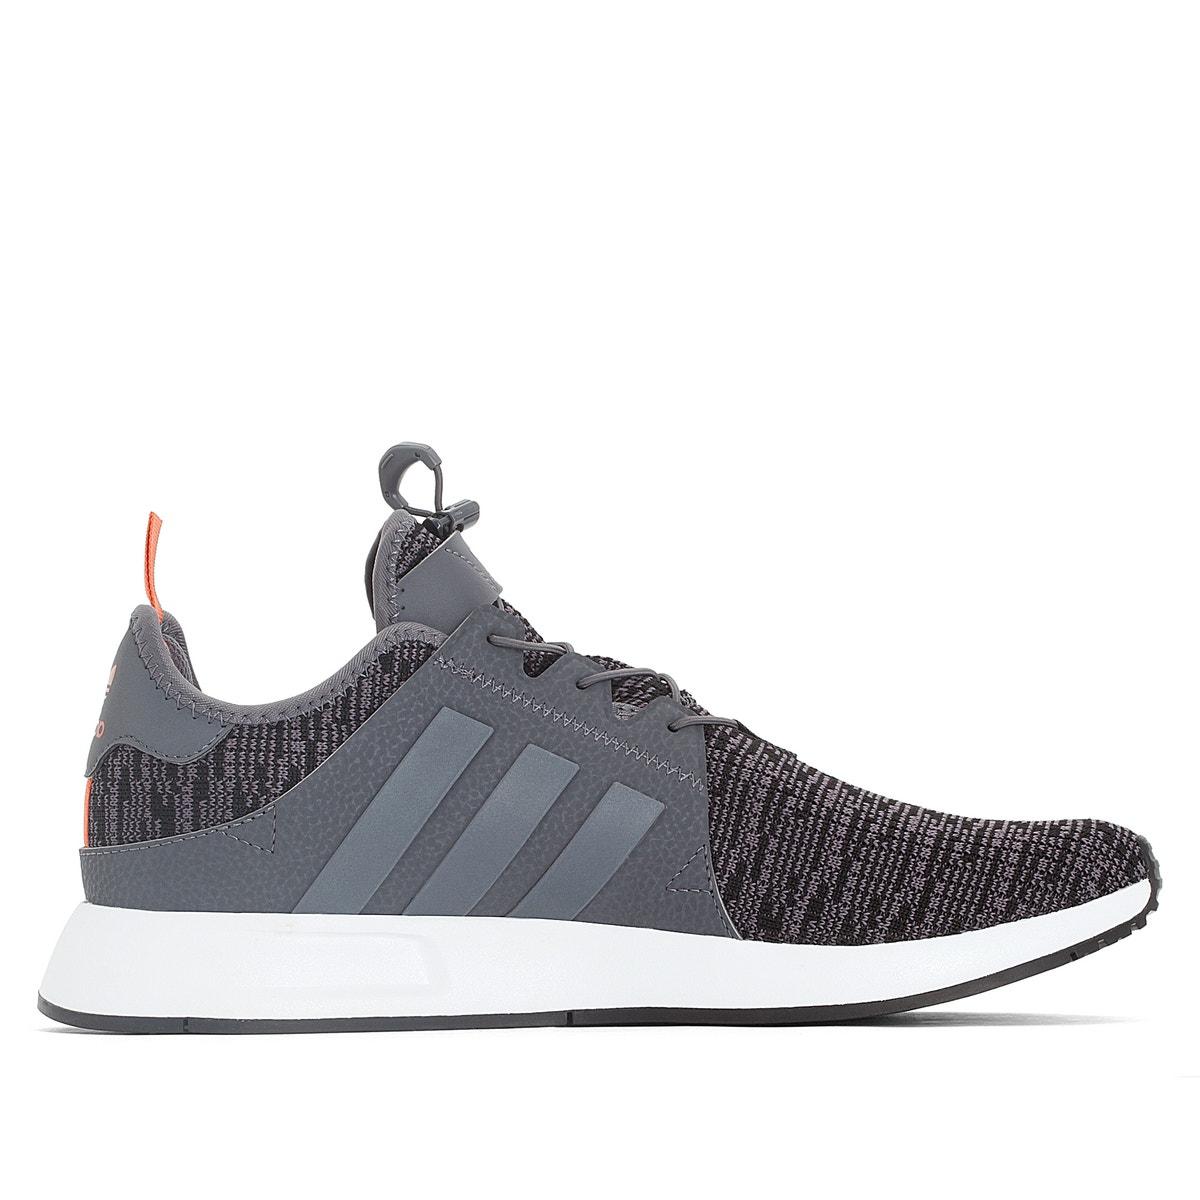 adidas Originals - Αθλητικά παπούτσια X_PLR 350078327 - 3442